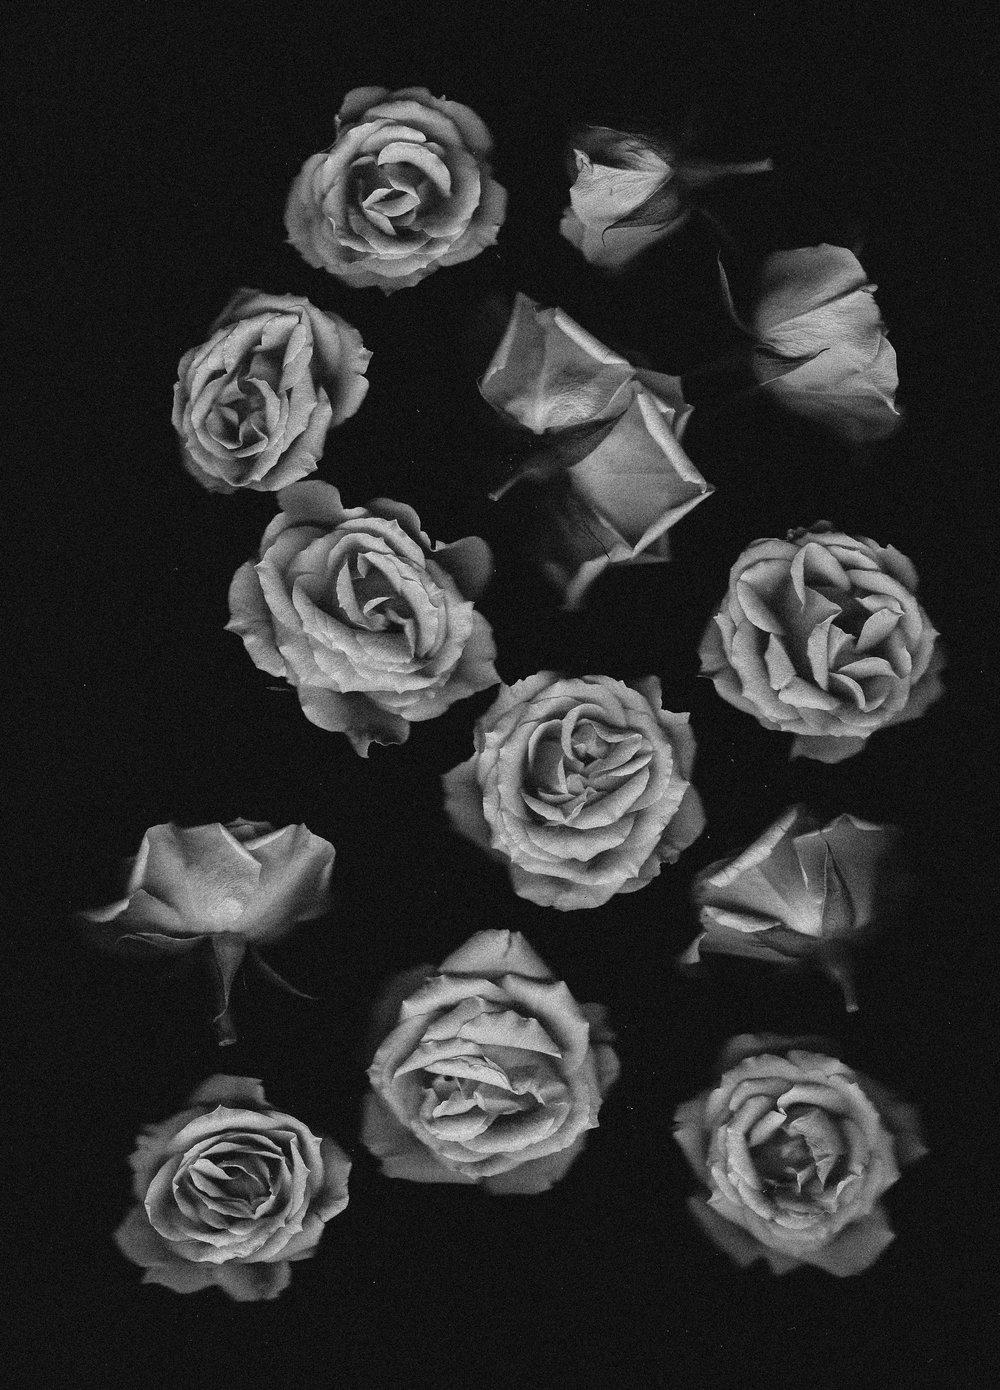 flower-roses-scan-2 copy.jpg